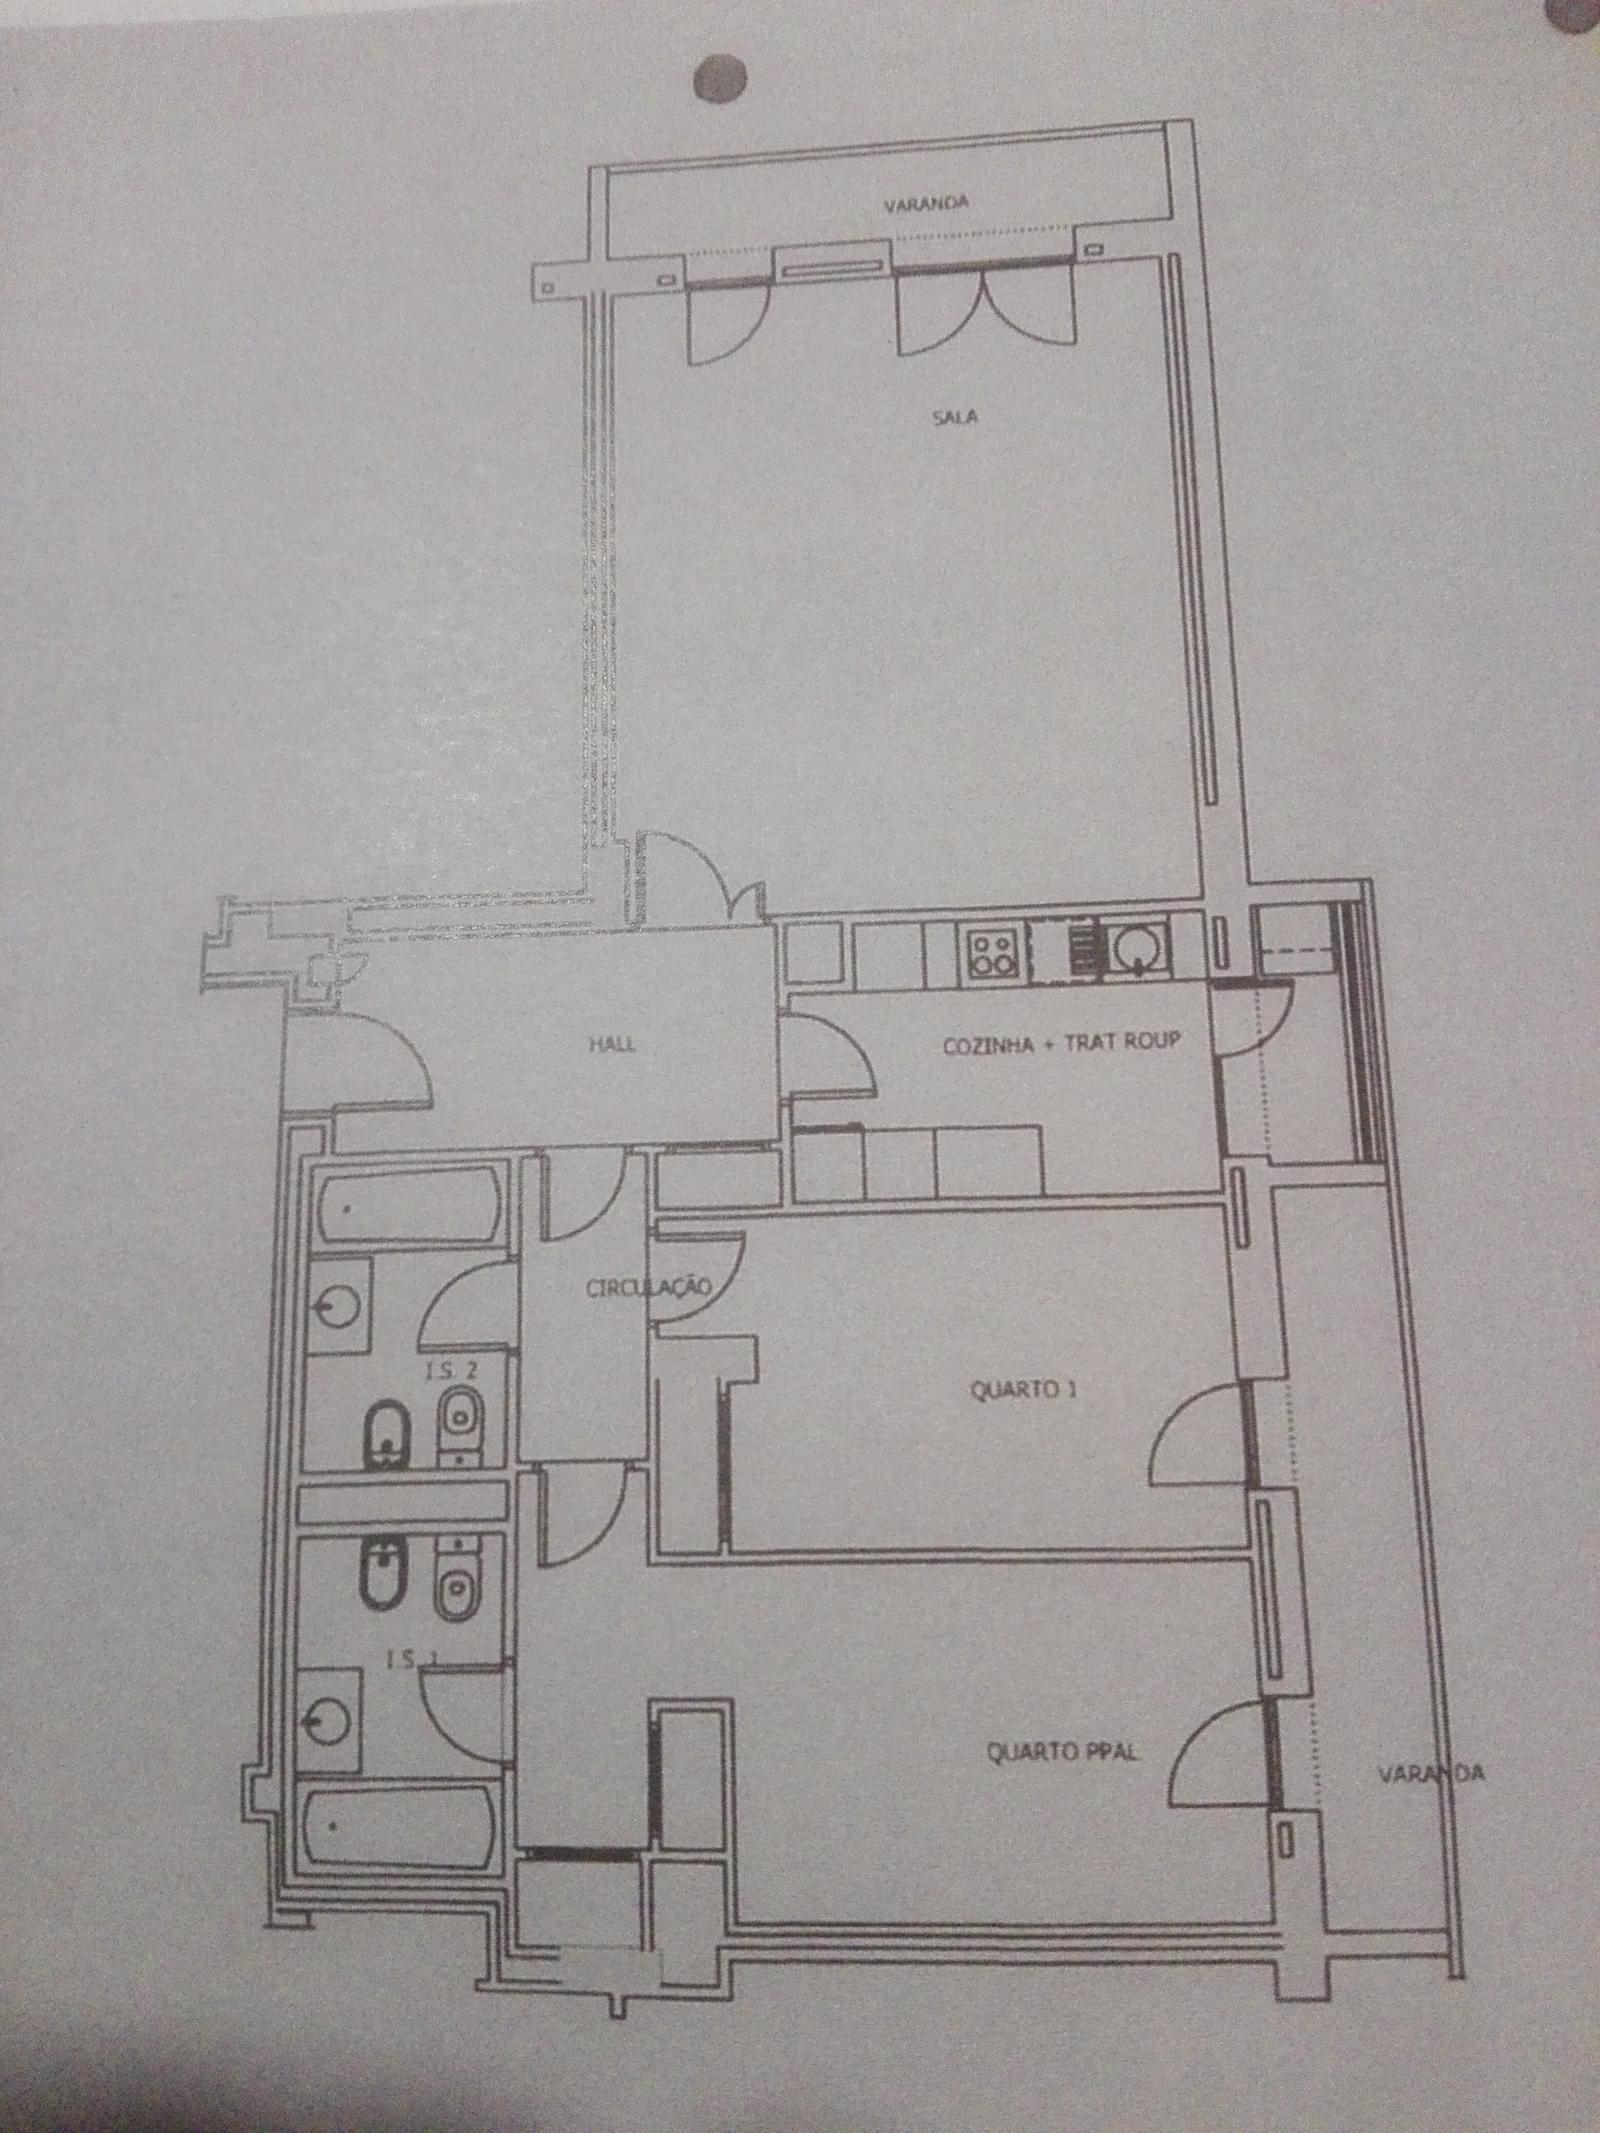 pf18814-apartamento-t2-lisboa-21ece8cc-89ae-4fef-aa2a-dda74f2db57d